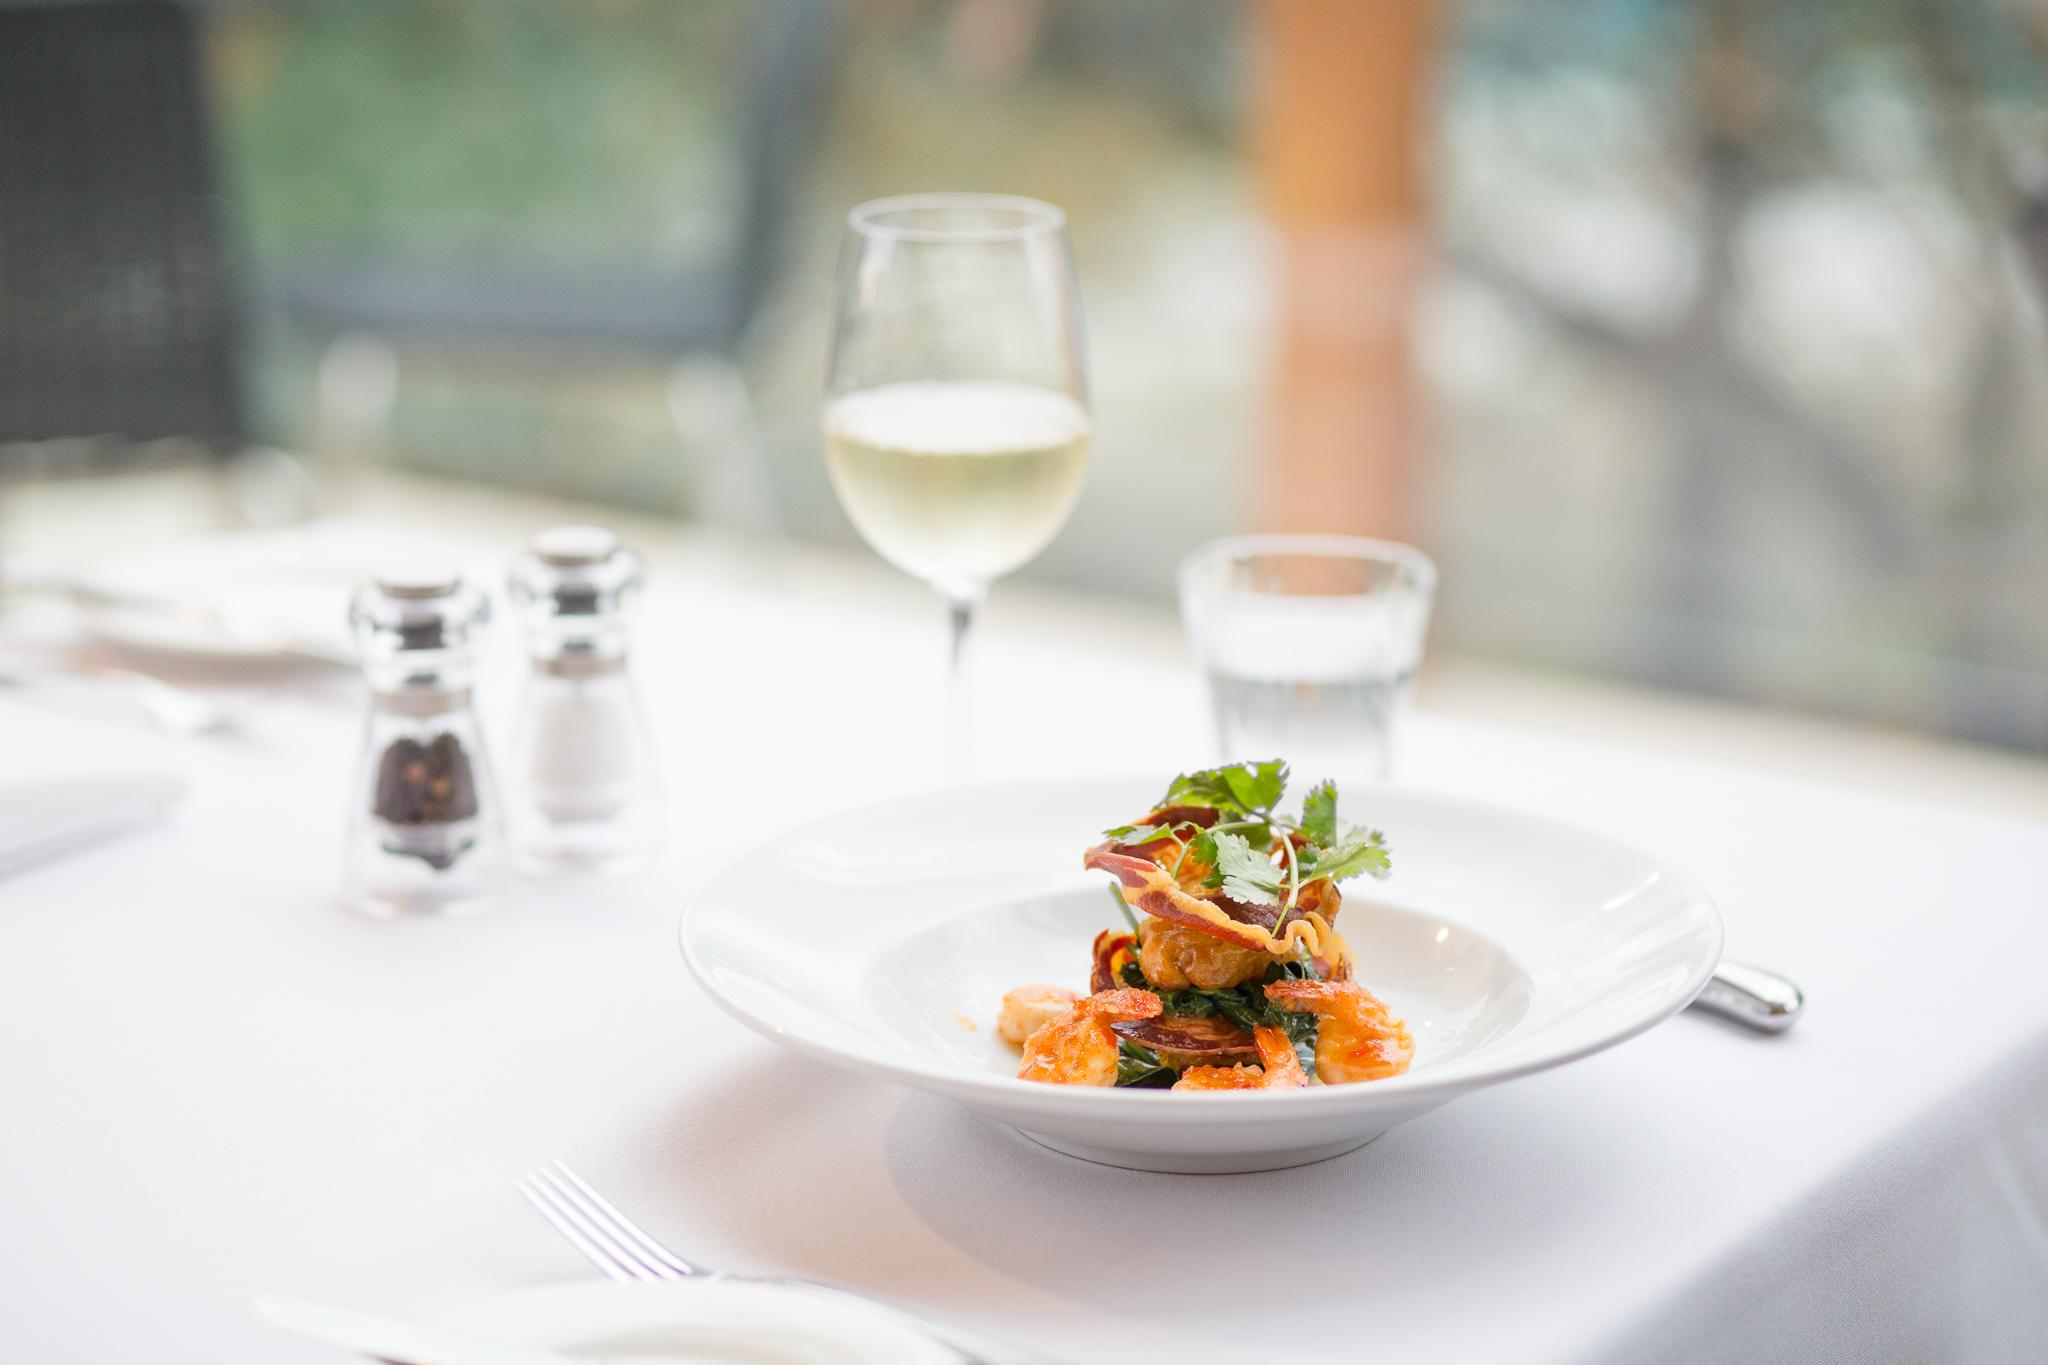 The Weekly Photography Challenge – Food